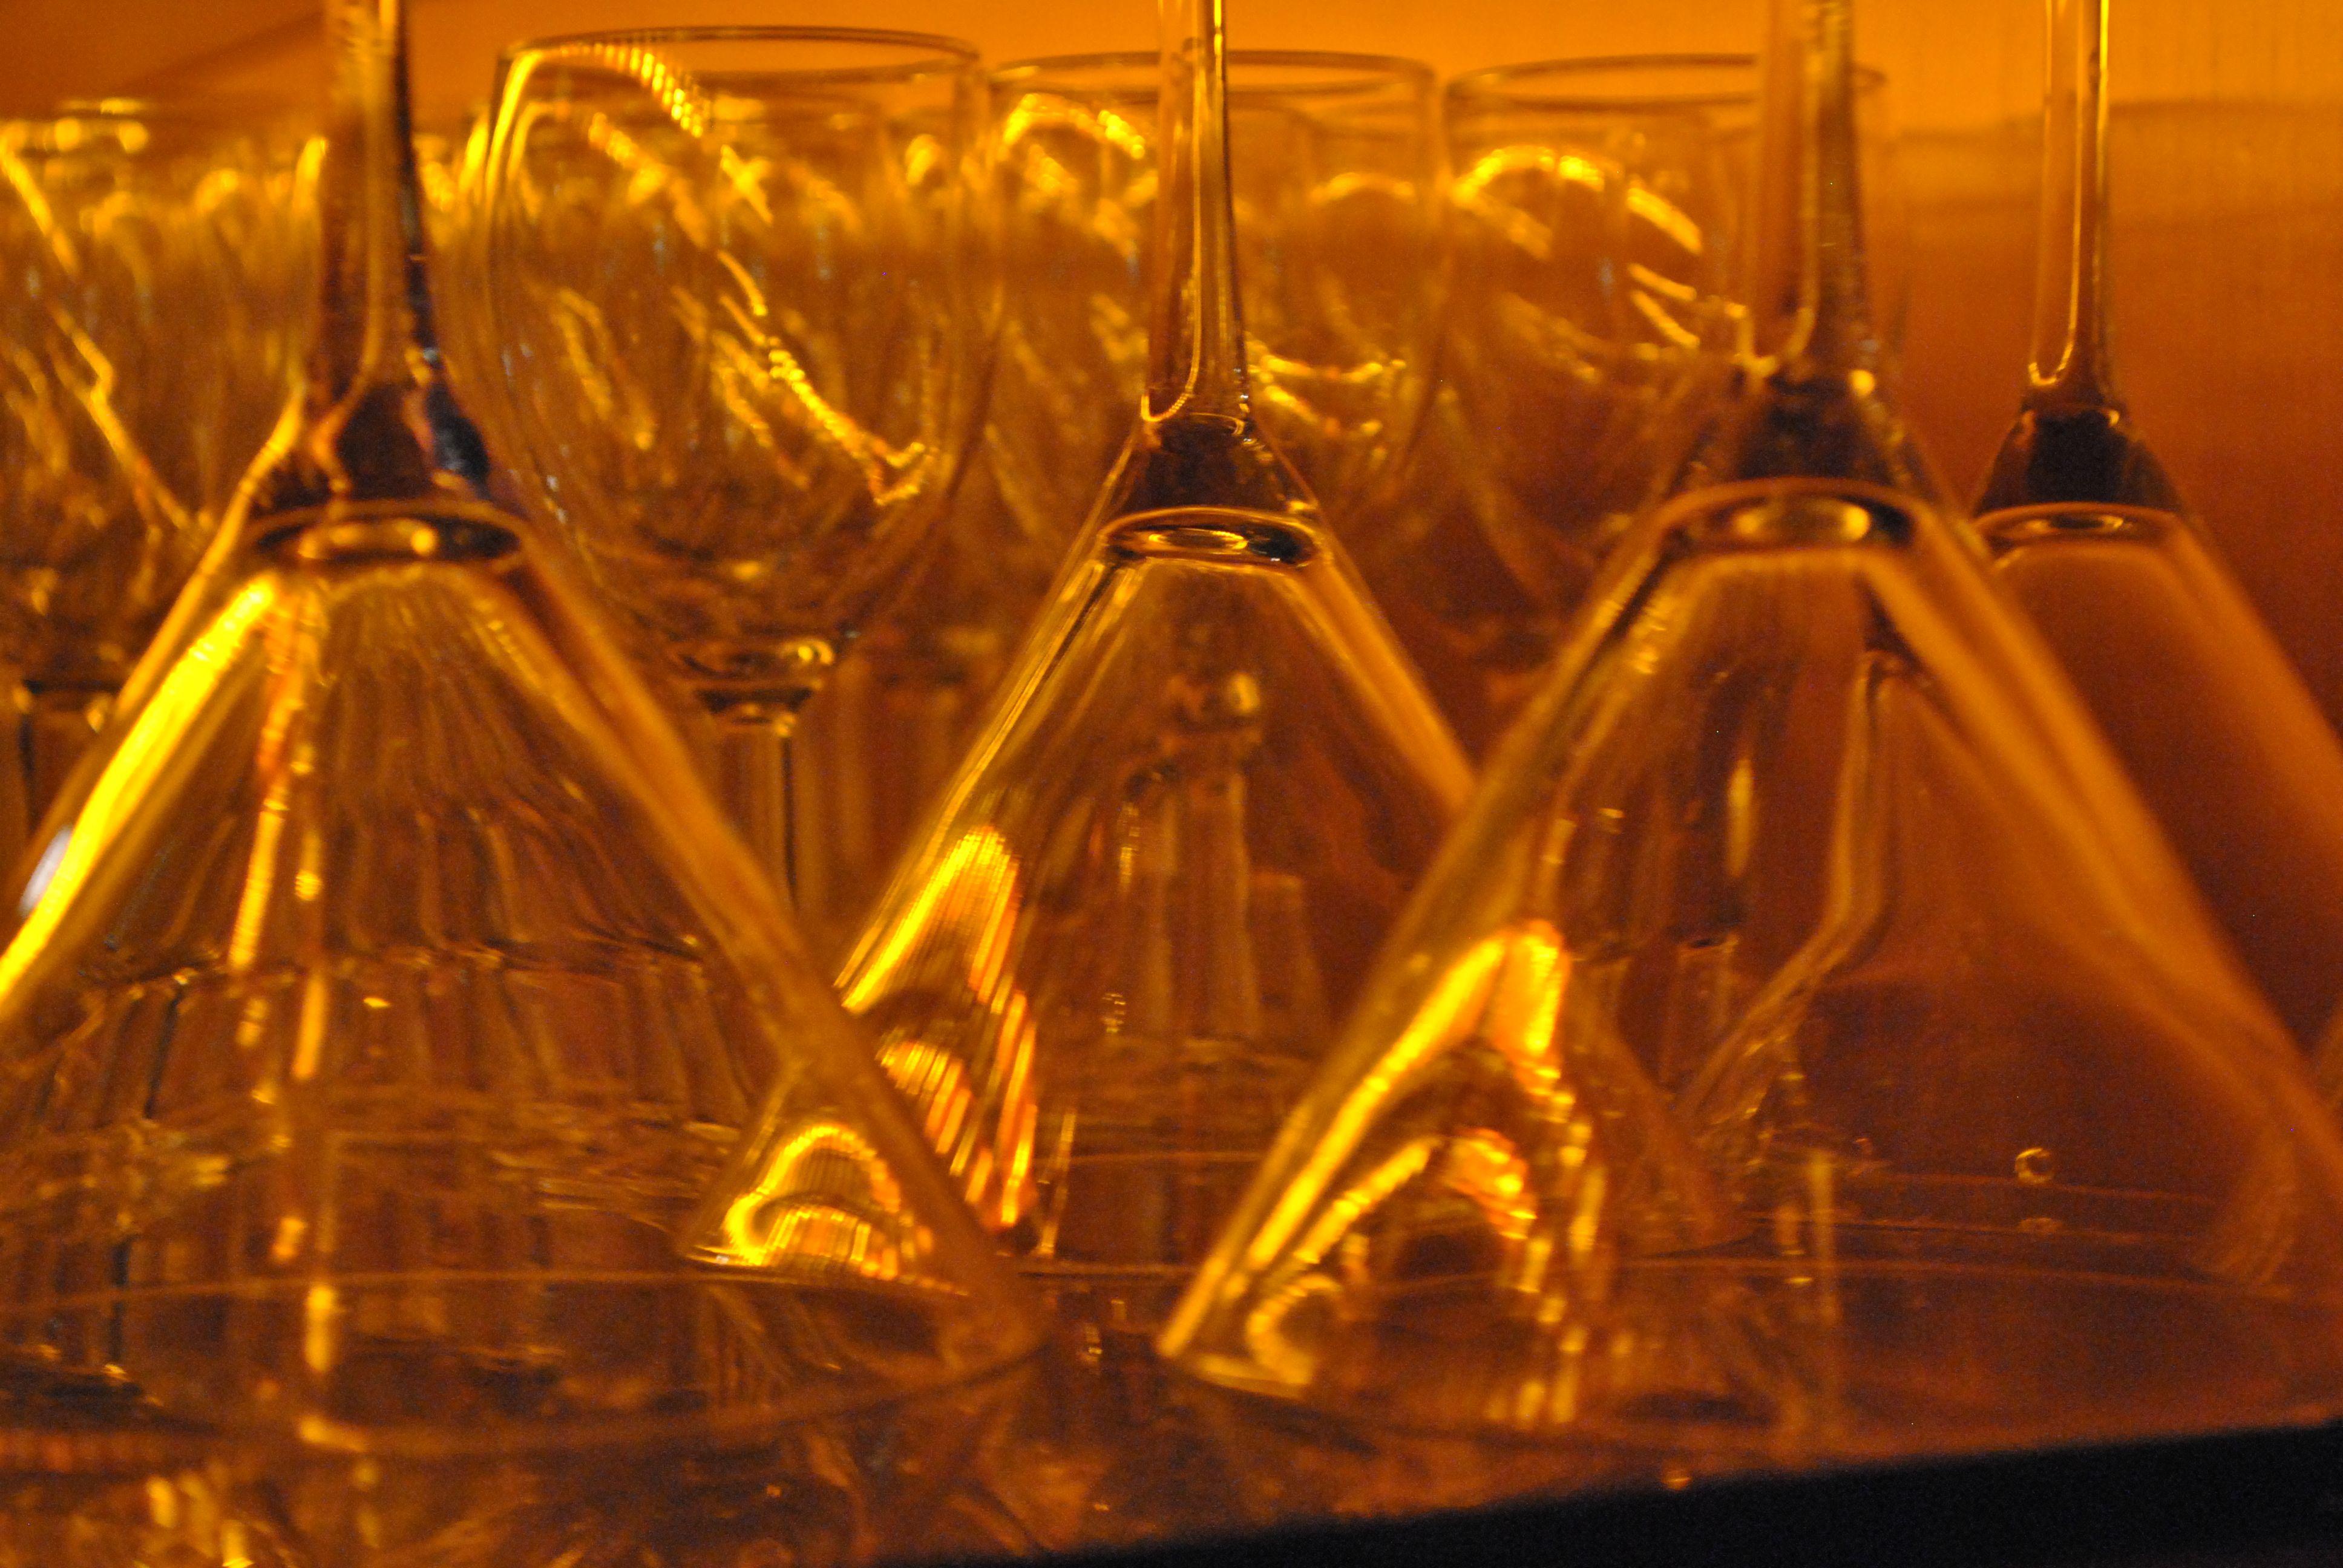 Coctailglasses at a bar